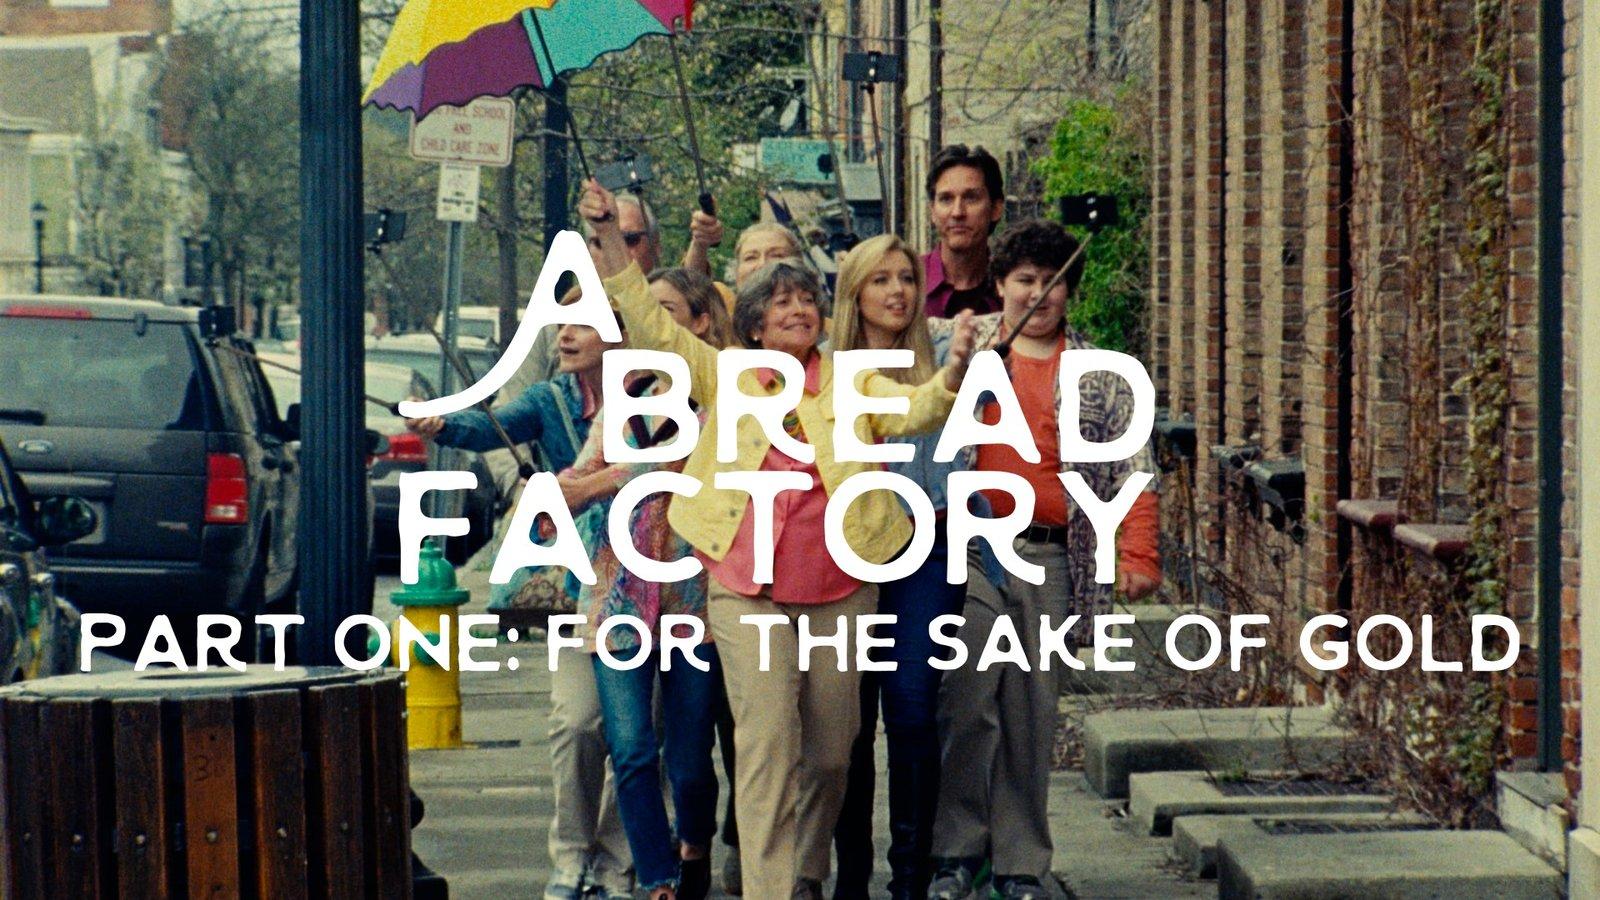 A Bread Factory, Part 1